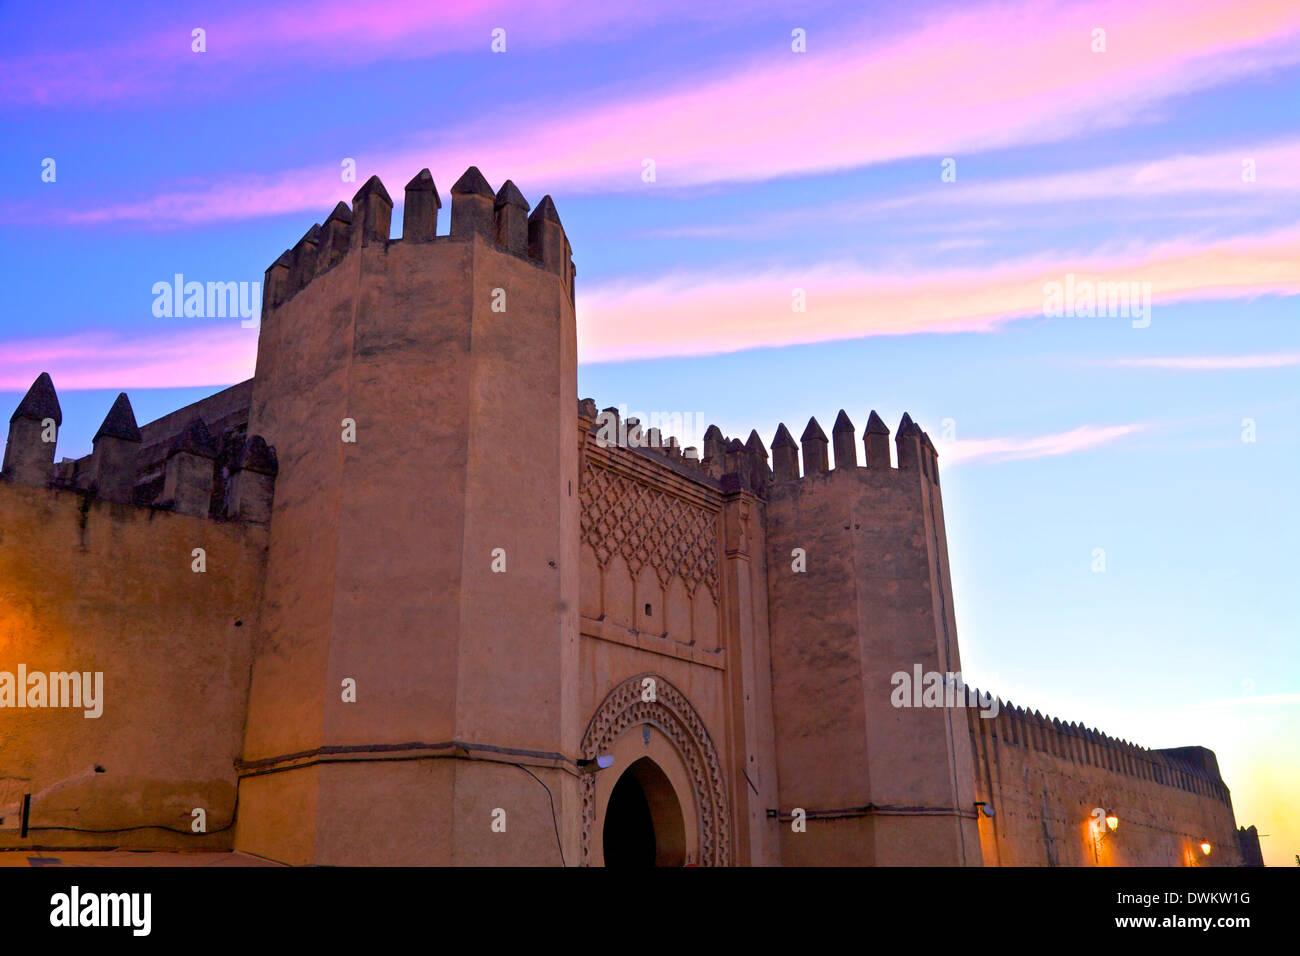 Lugar Bou Jeloud, Fez, Marruecos, Norte de África, África Imagen De Stock